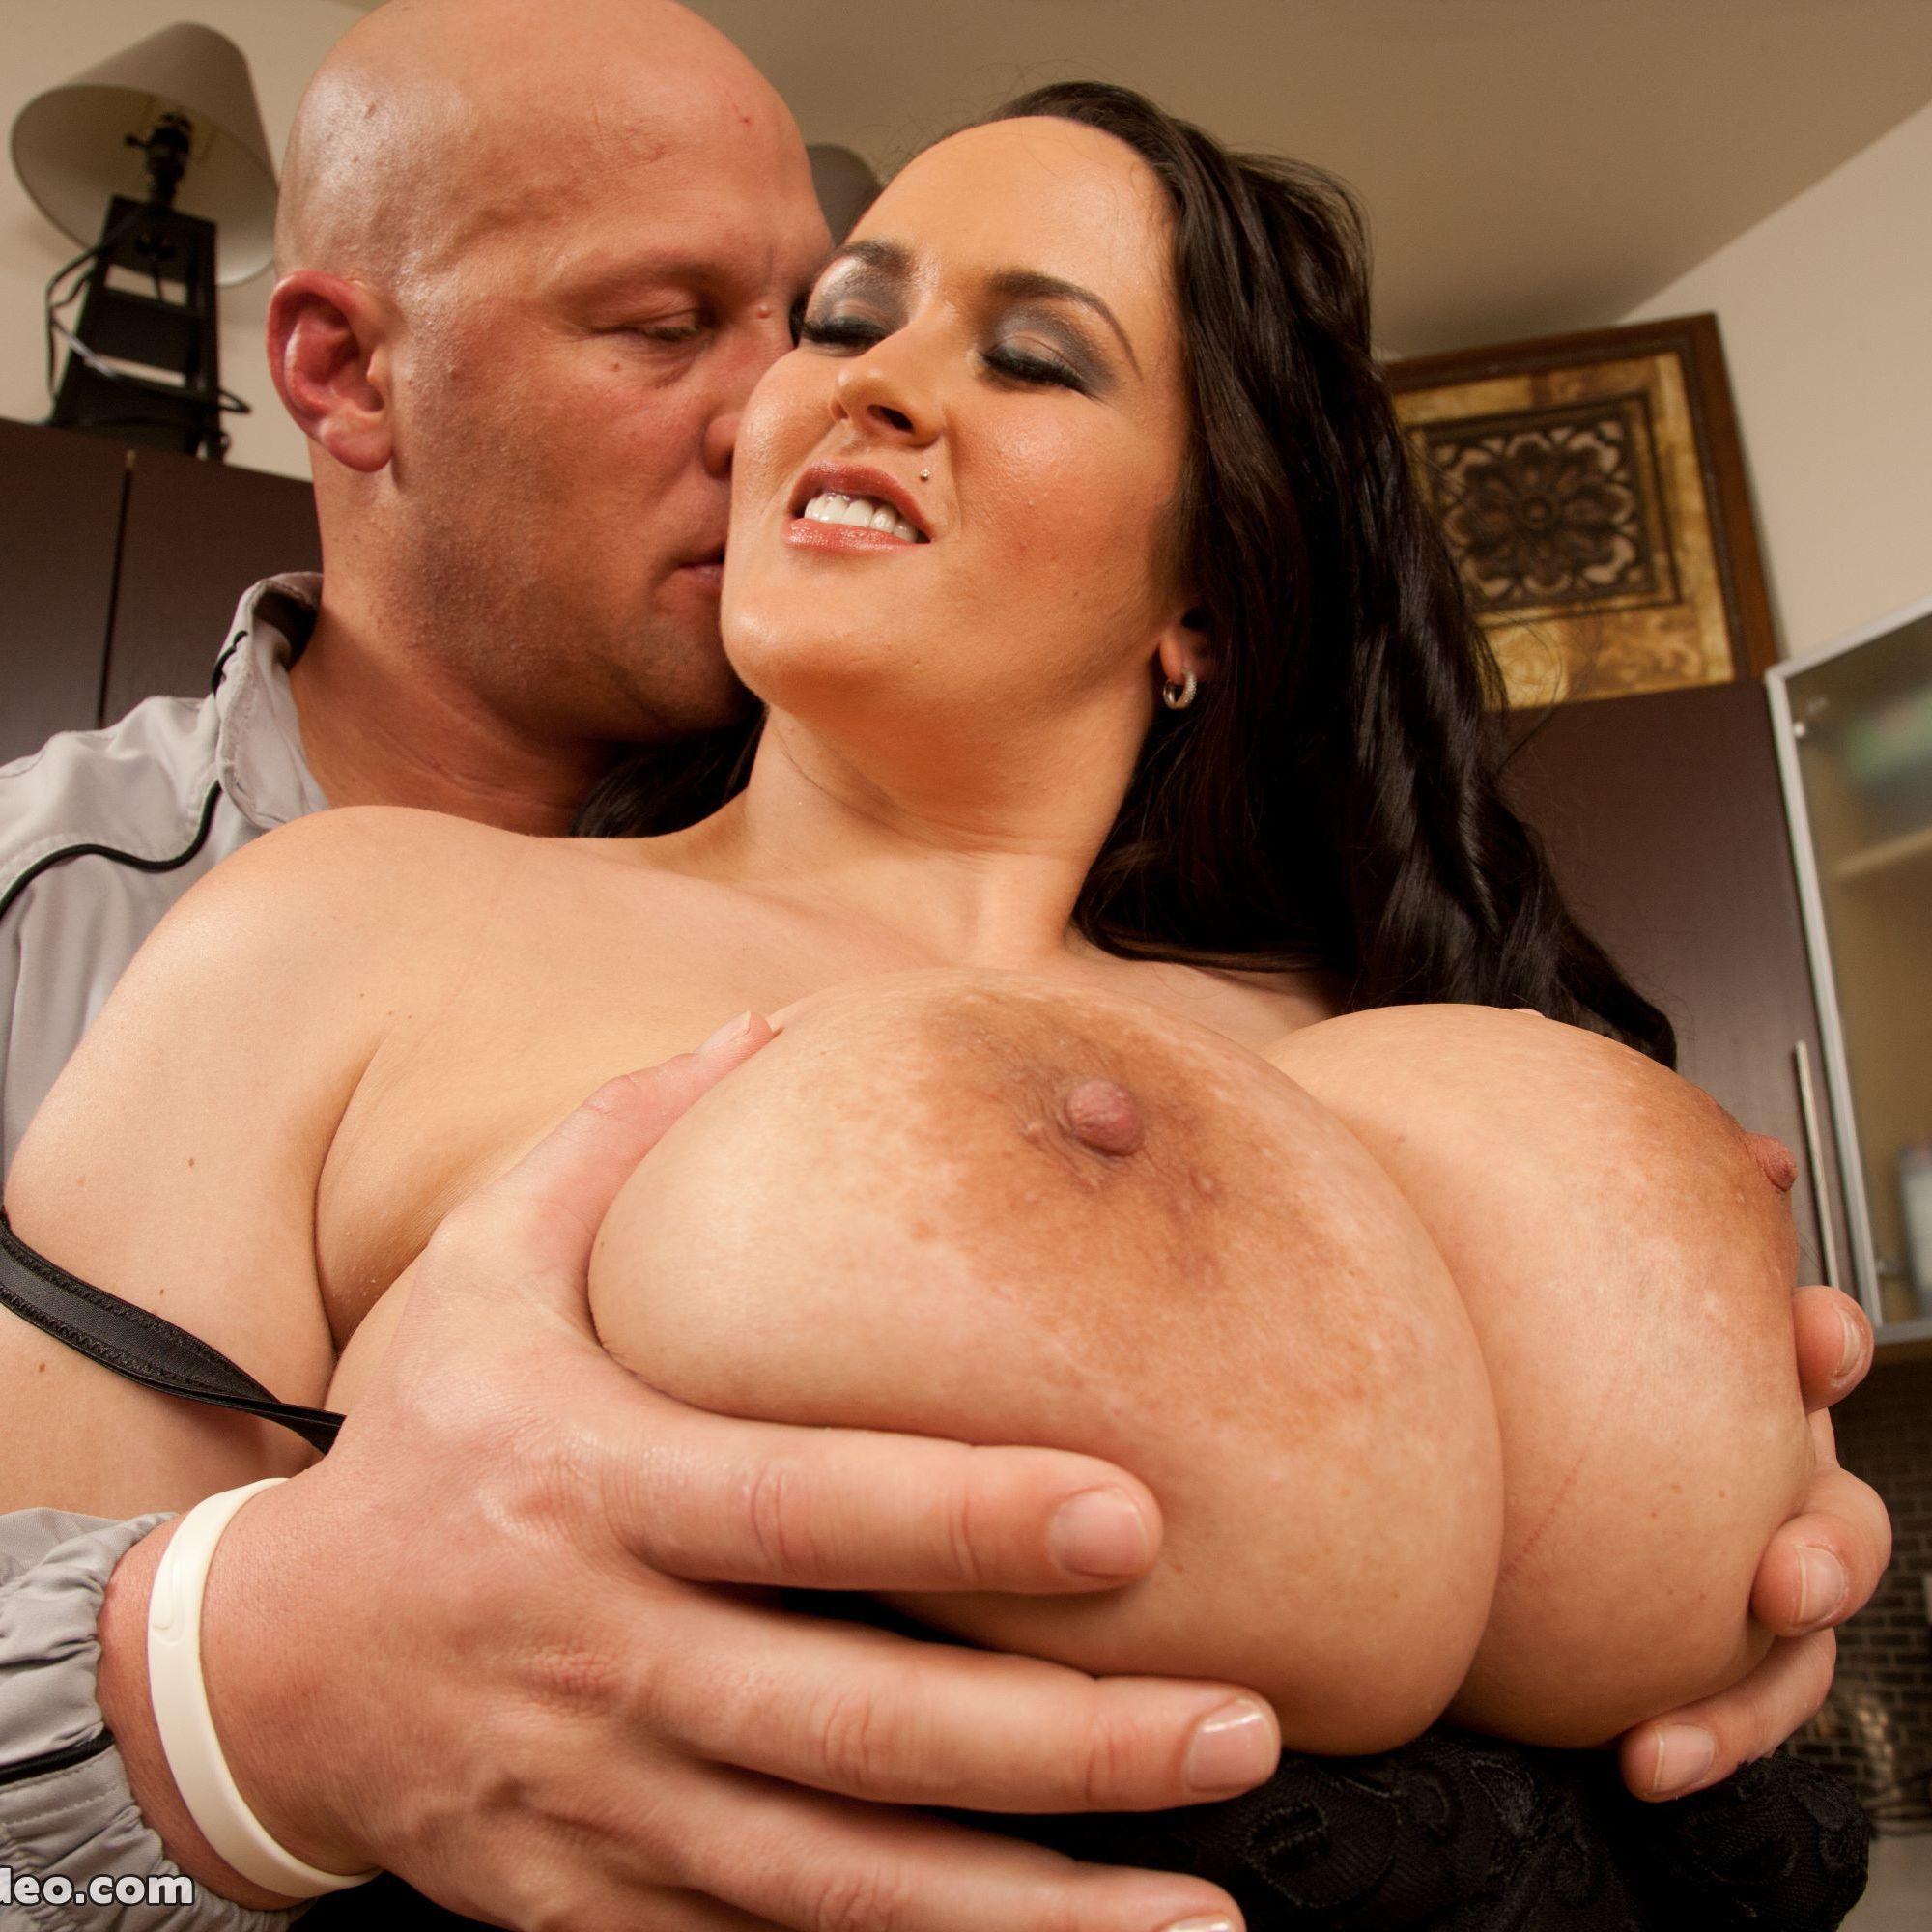 Carmella XXL se morfa al pelado Christian.